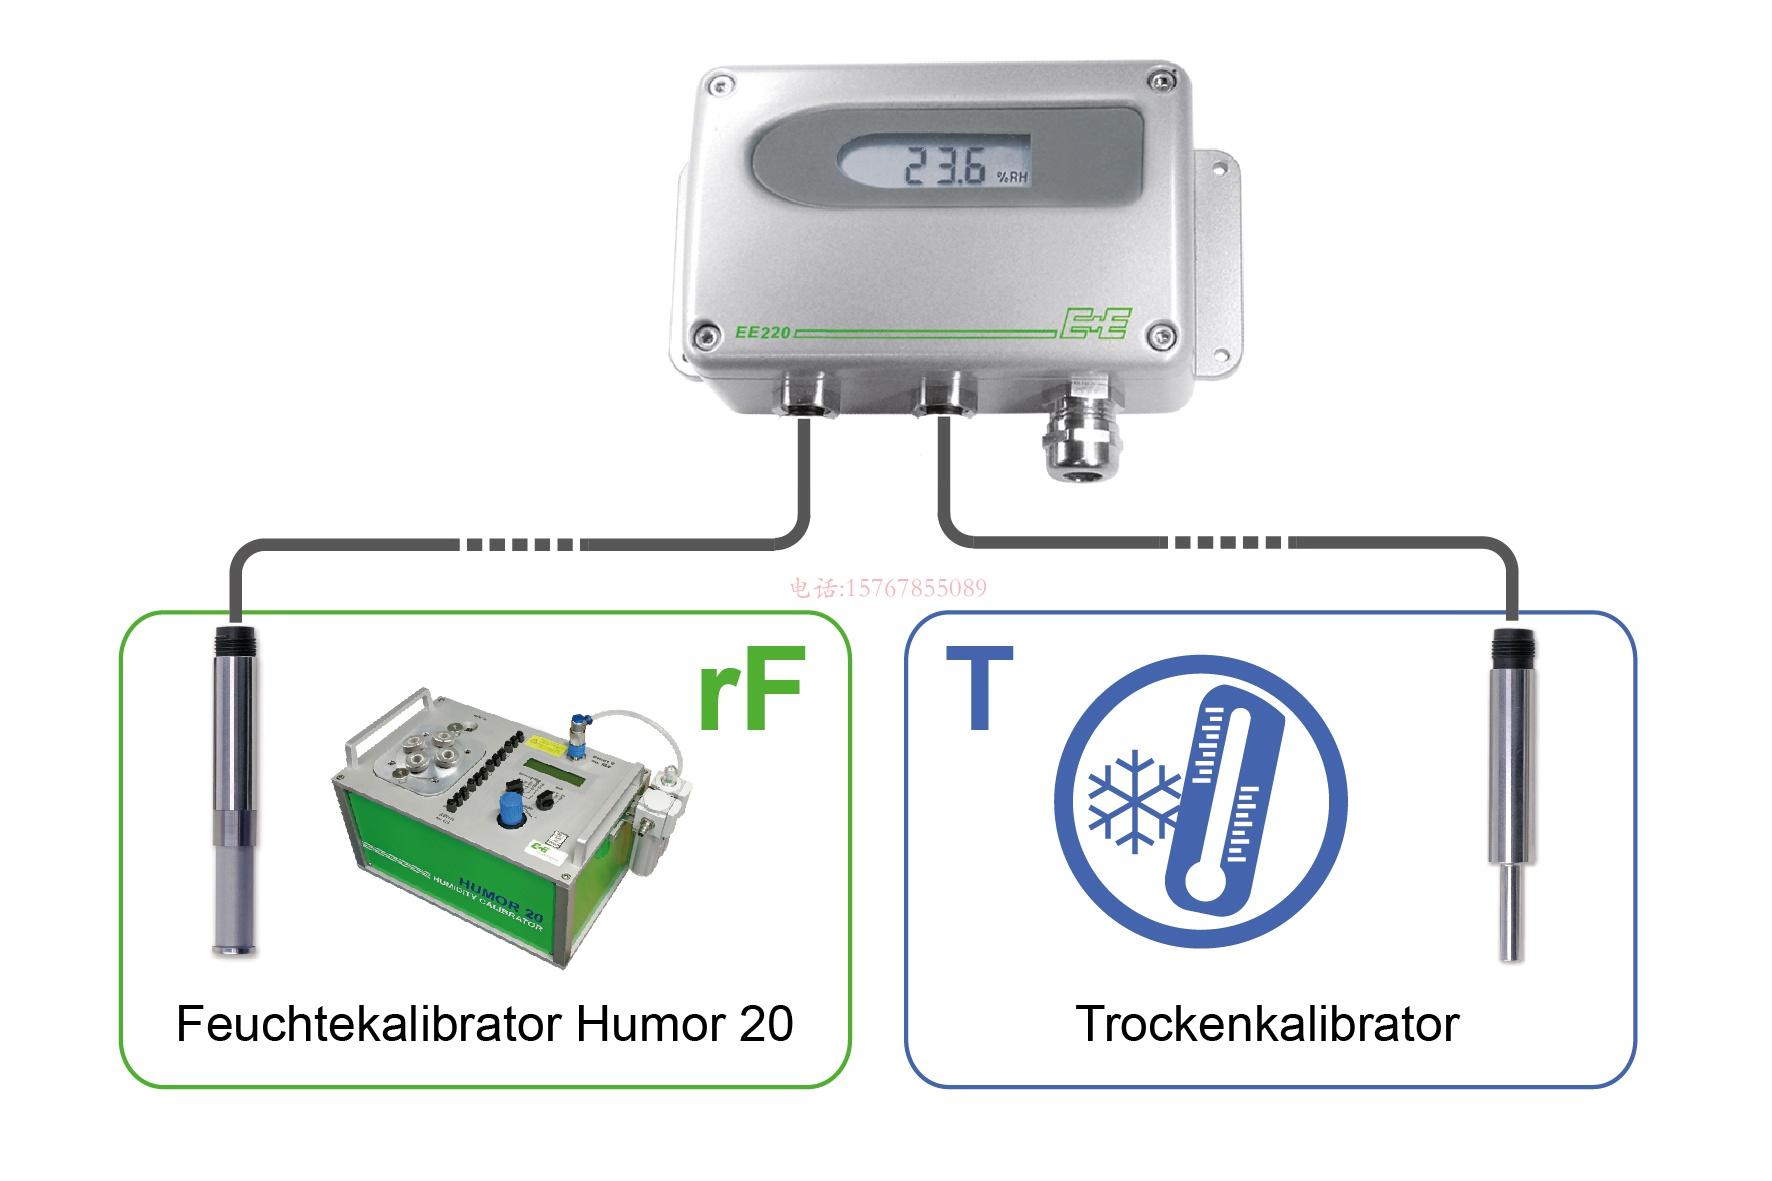 EE22温湿度变送器、EE220温湿度变送器